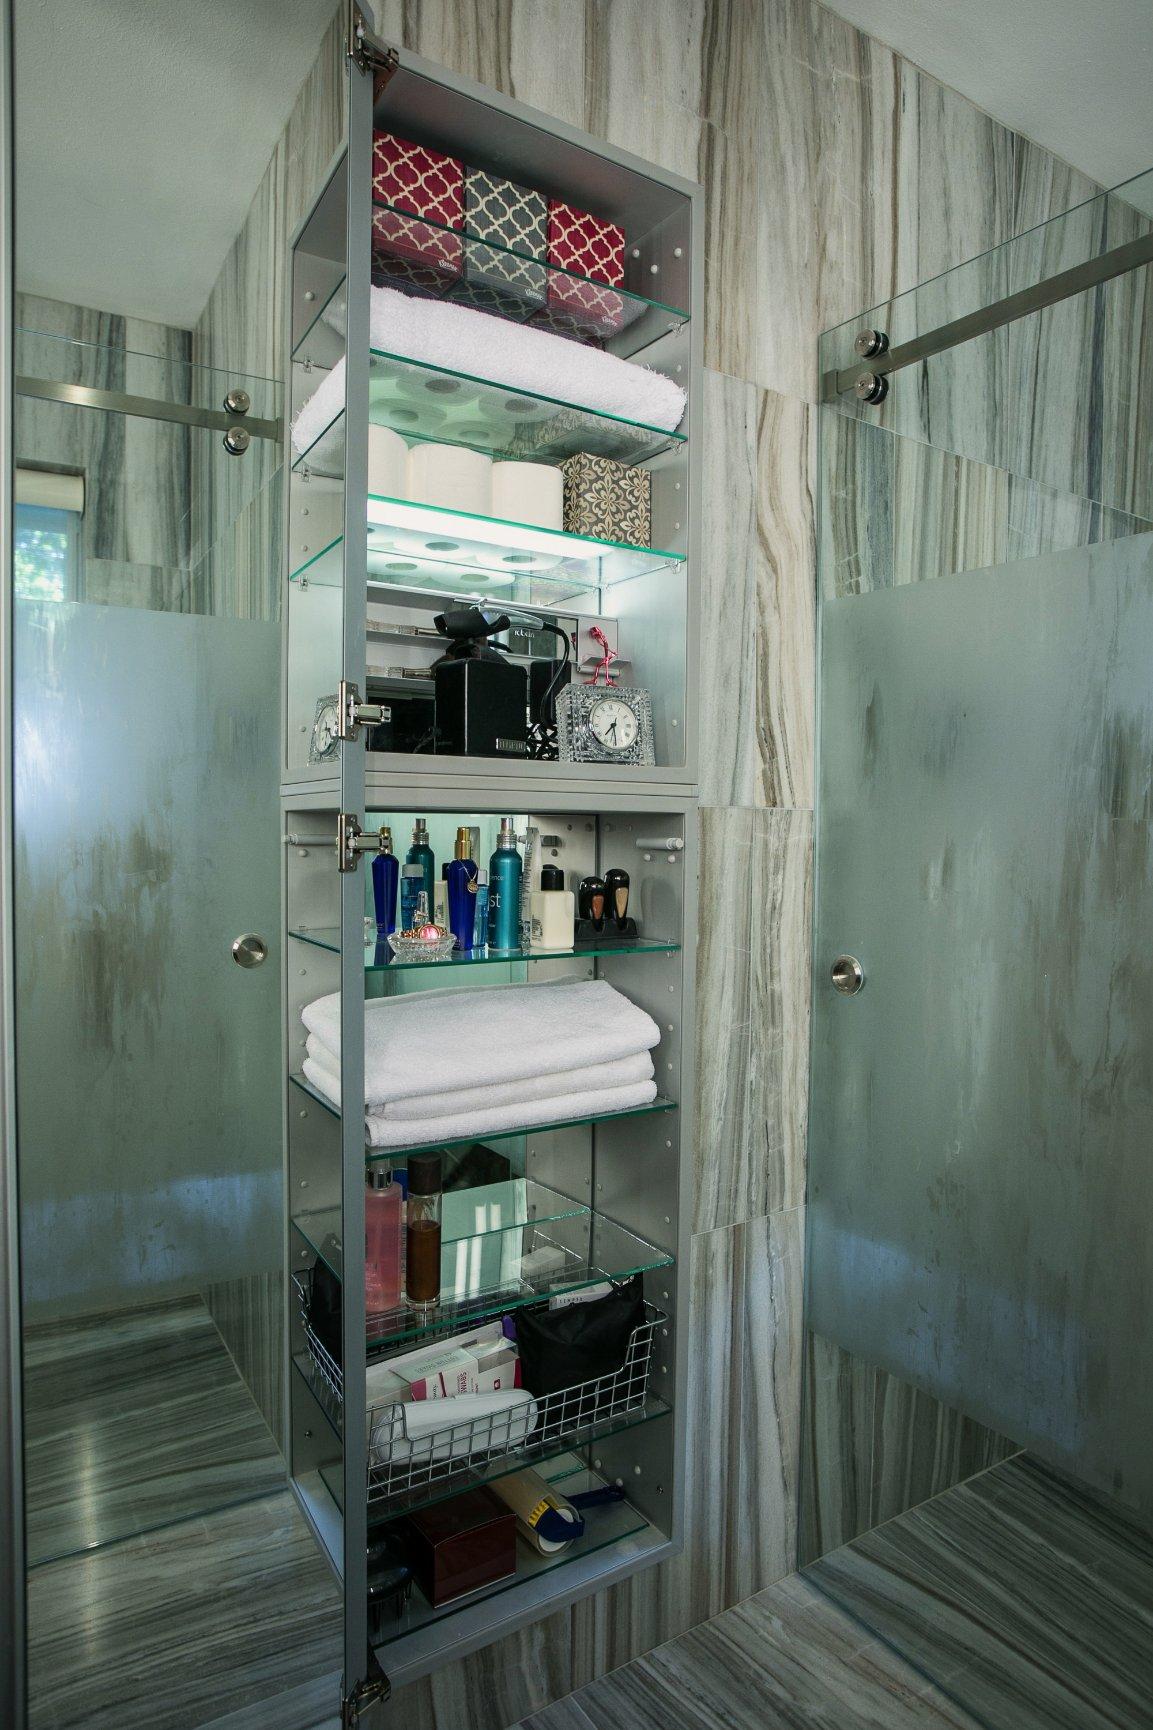 Storage options for master bath - custom interior design by Jill Ornelas at Ambiance